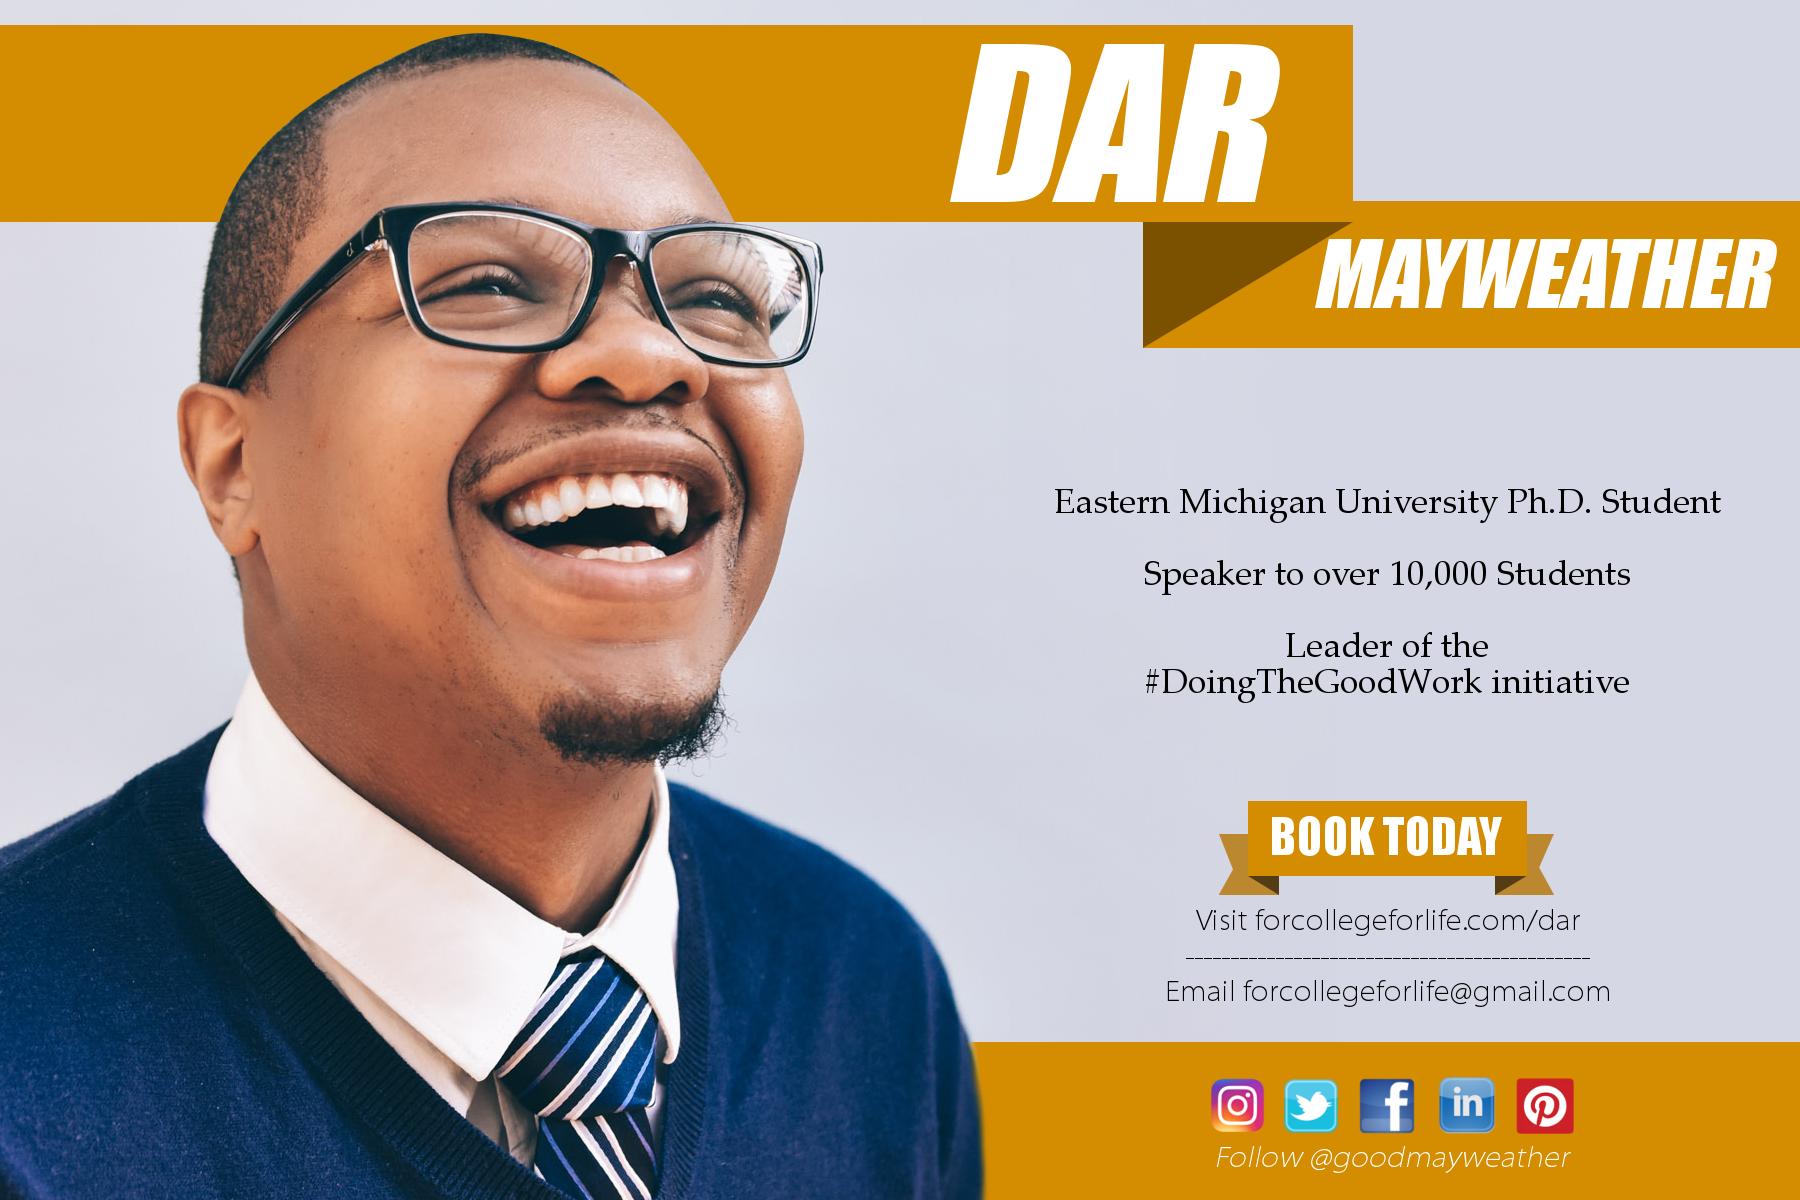 Doing The Good Work-Dar Mayweather